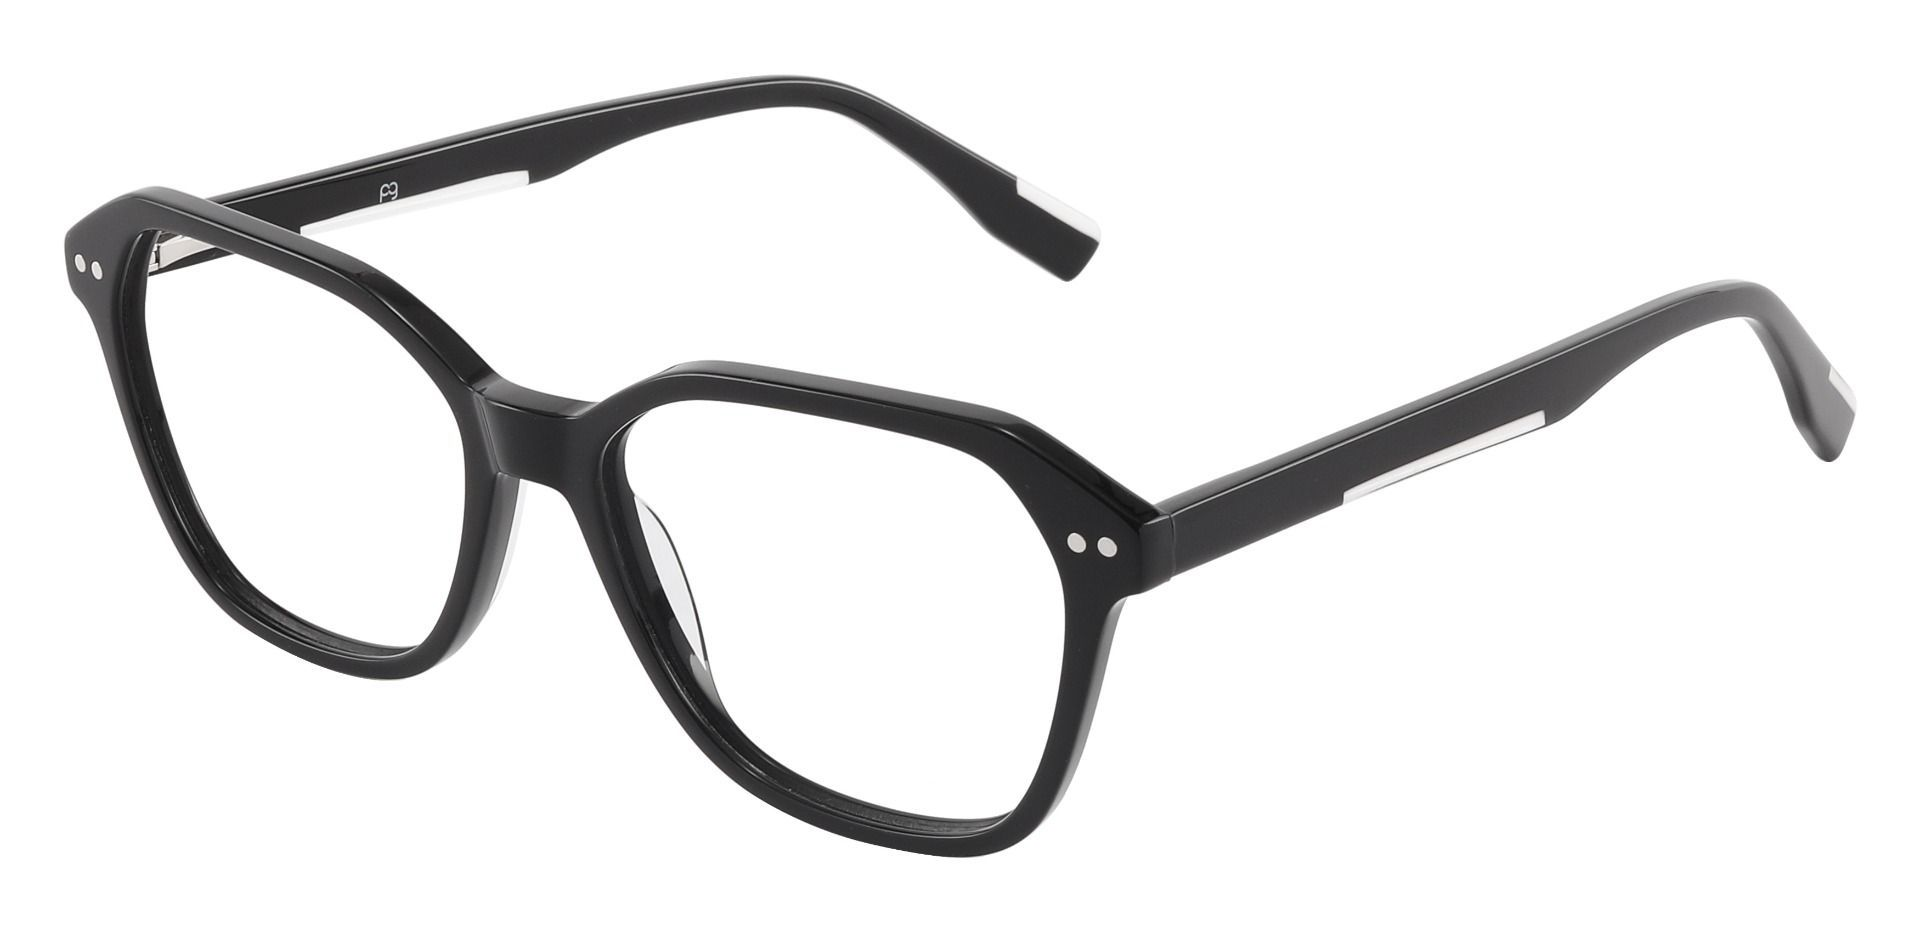 Cicero Geometric Prescription Glasses - Black